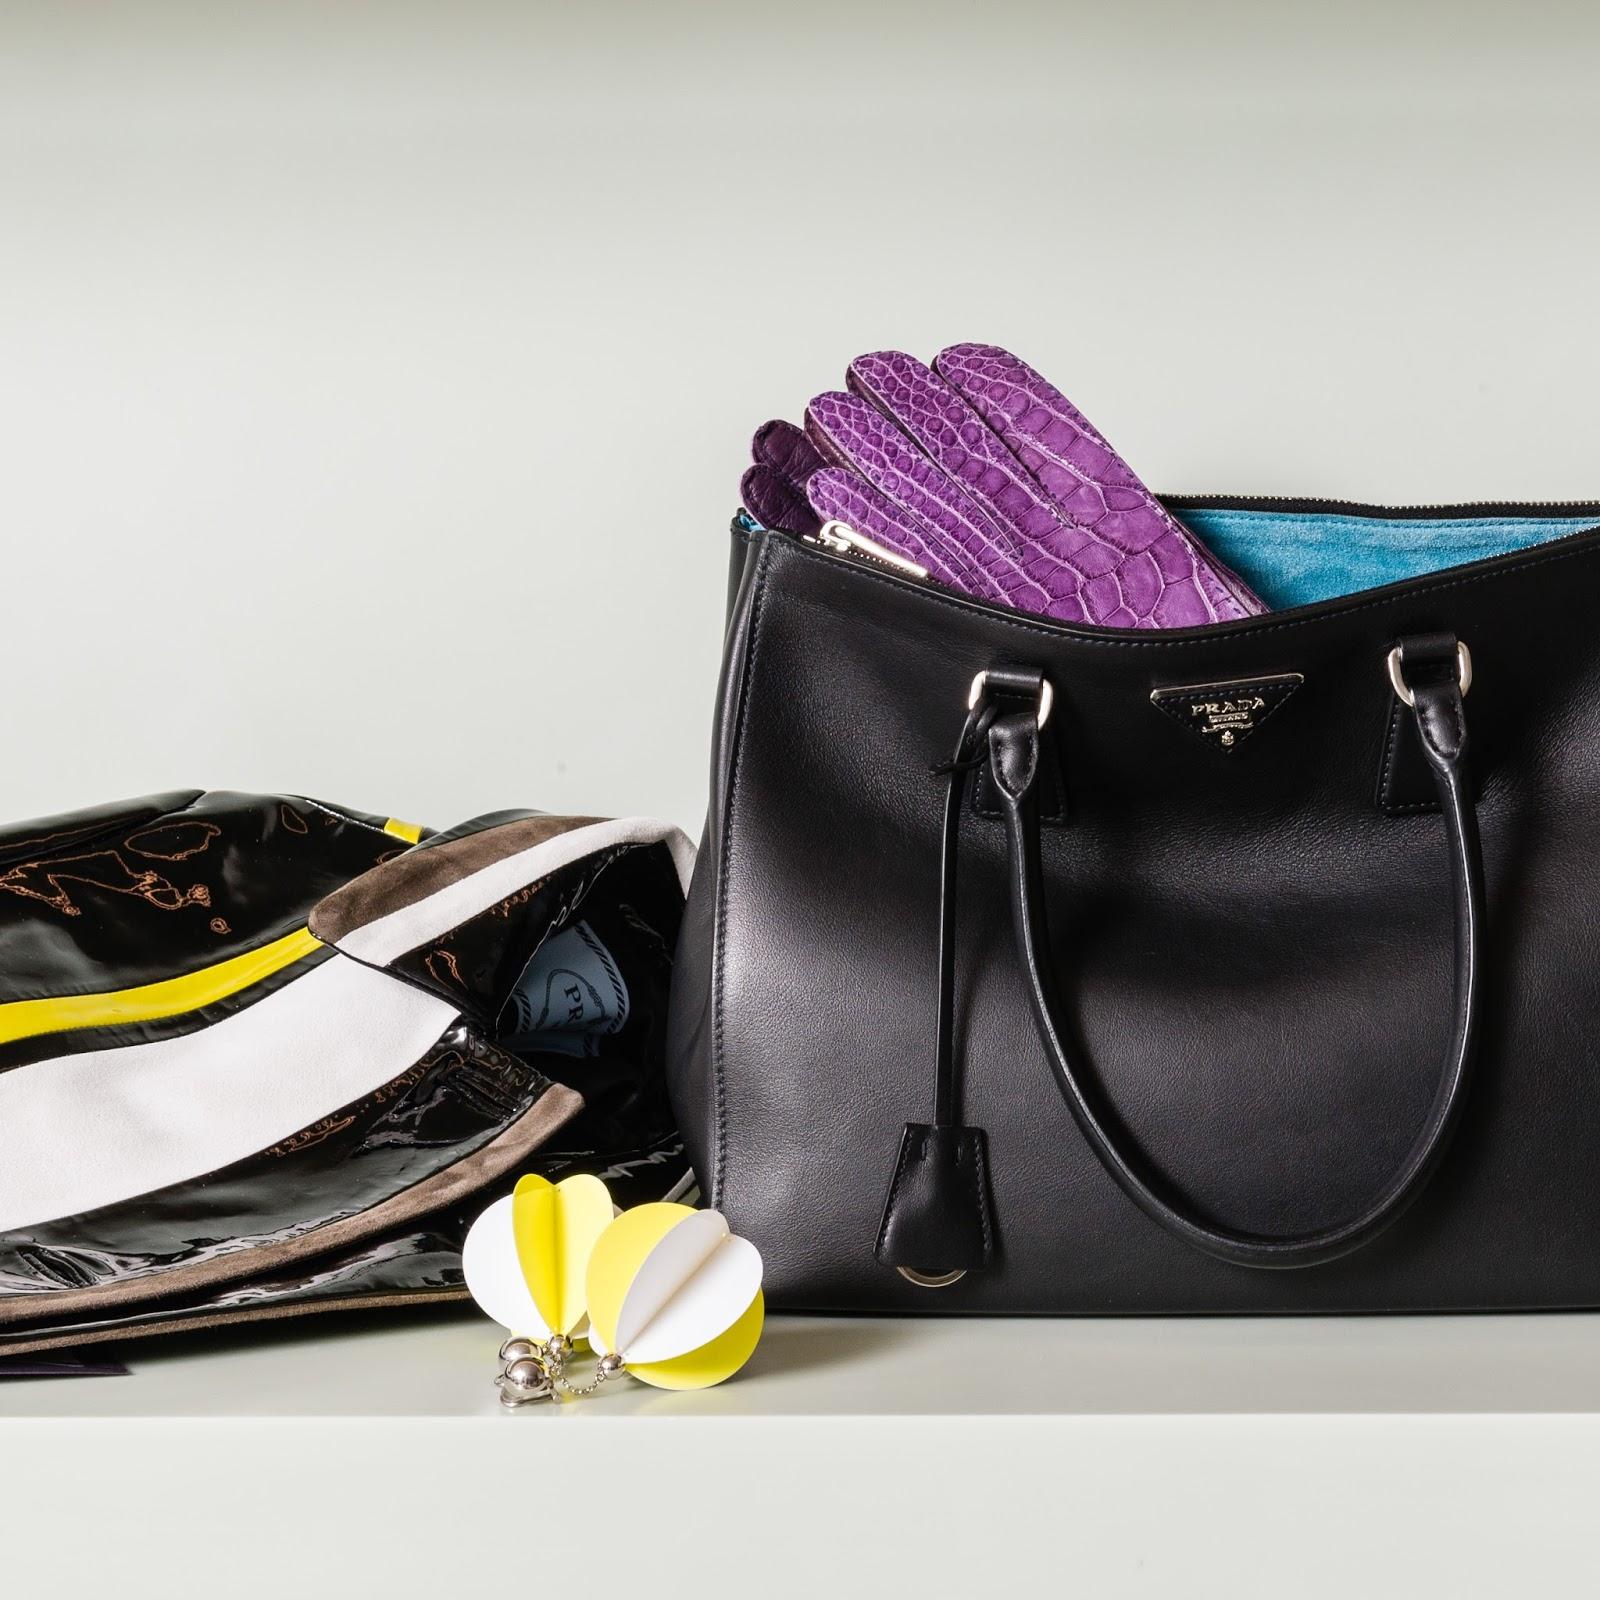 BagAddicts Anonymous: Prada Reinterprets the Iconic Galleria Bag